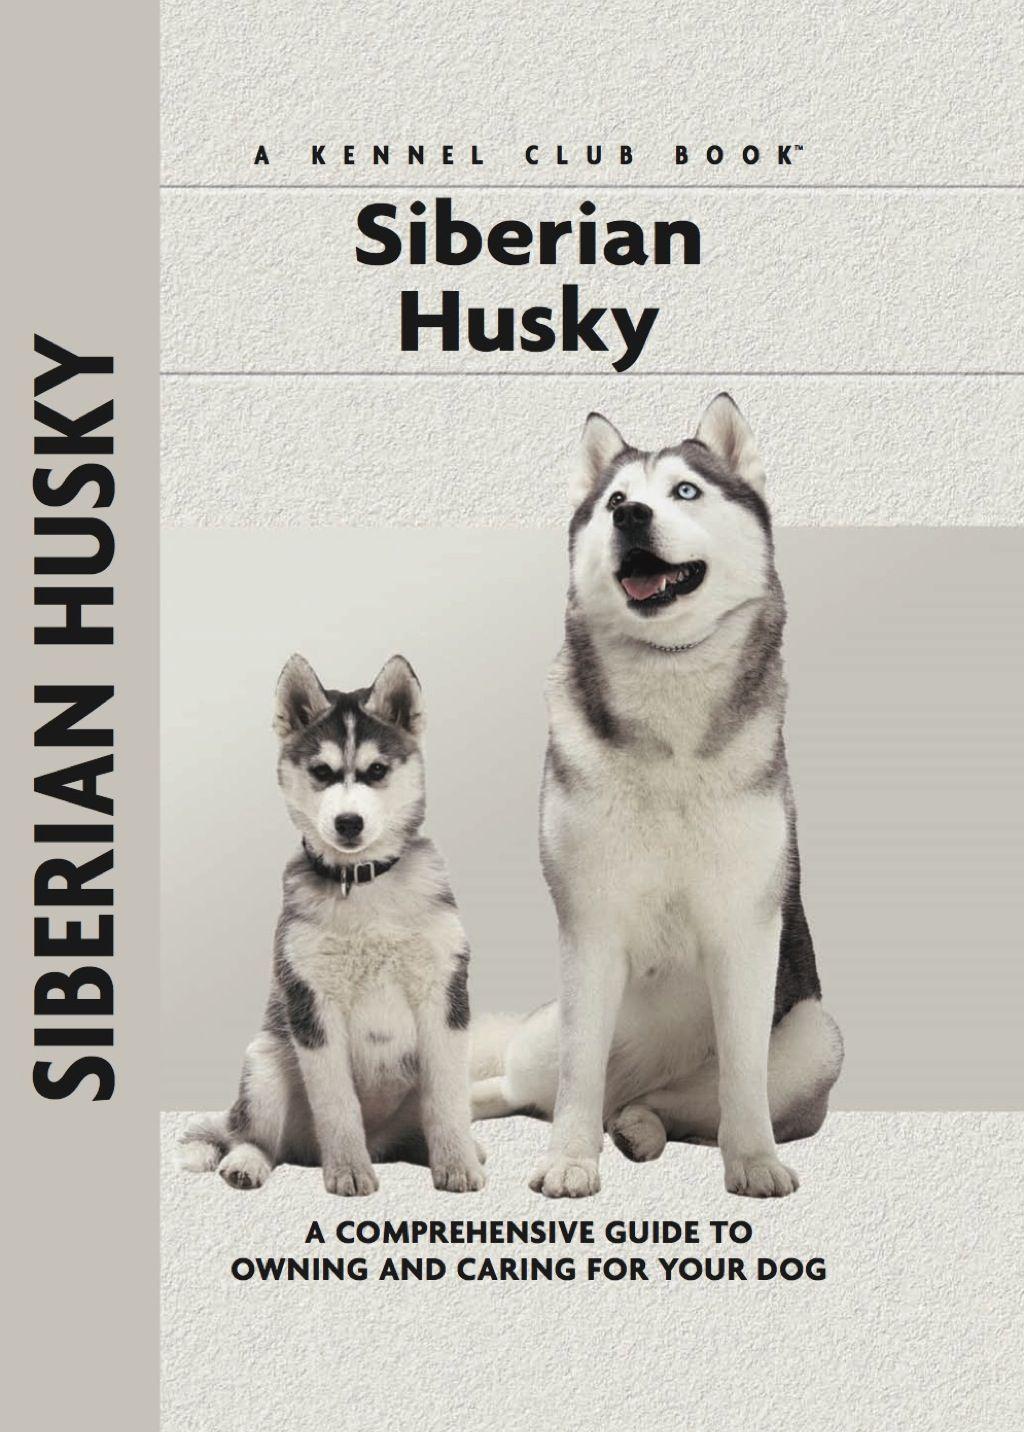 Siberian Husky Ebook Siberian Husky Dogs Husky